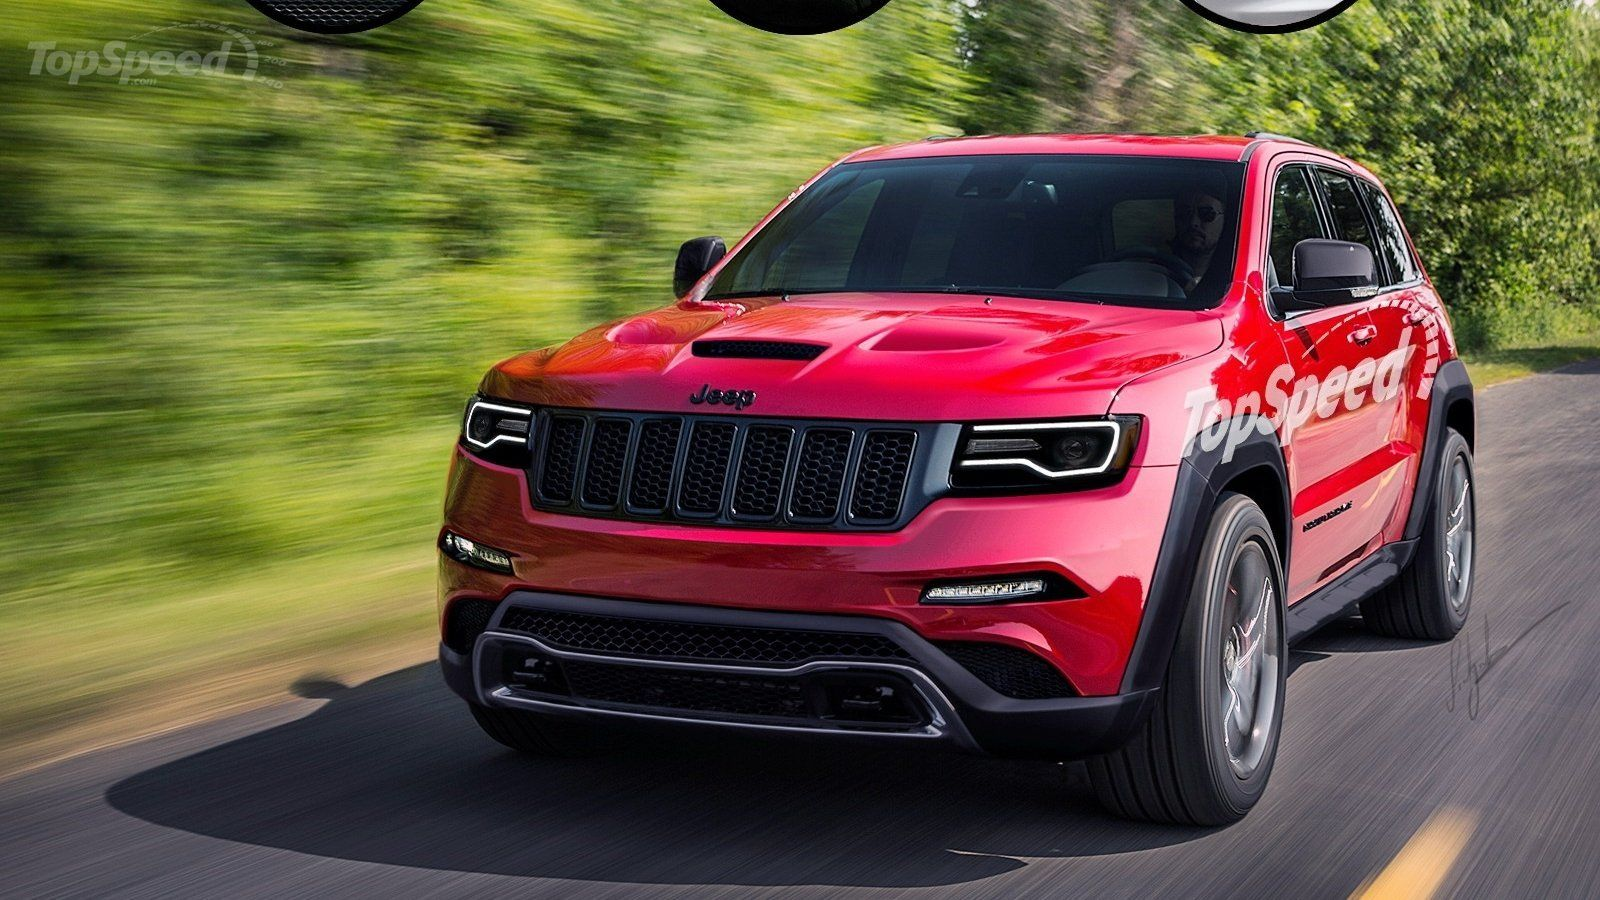 brace yourselves a jeep srt hellcat is coming imgur cars pinterest srt hellcat jeeps. Black Bedroom Furniture Sets. Home Design Ideas